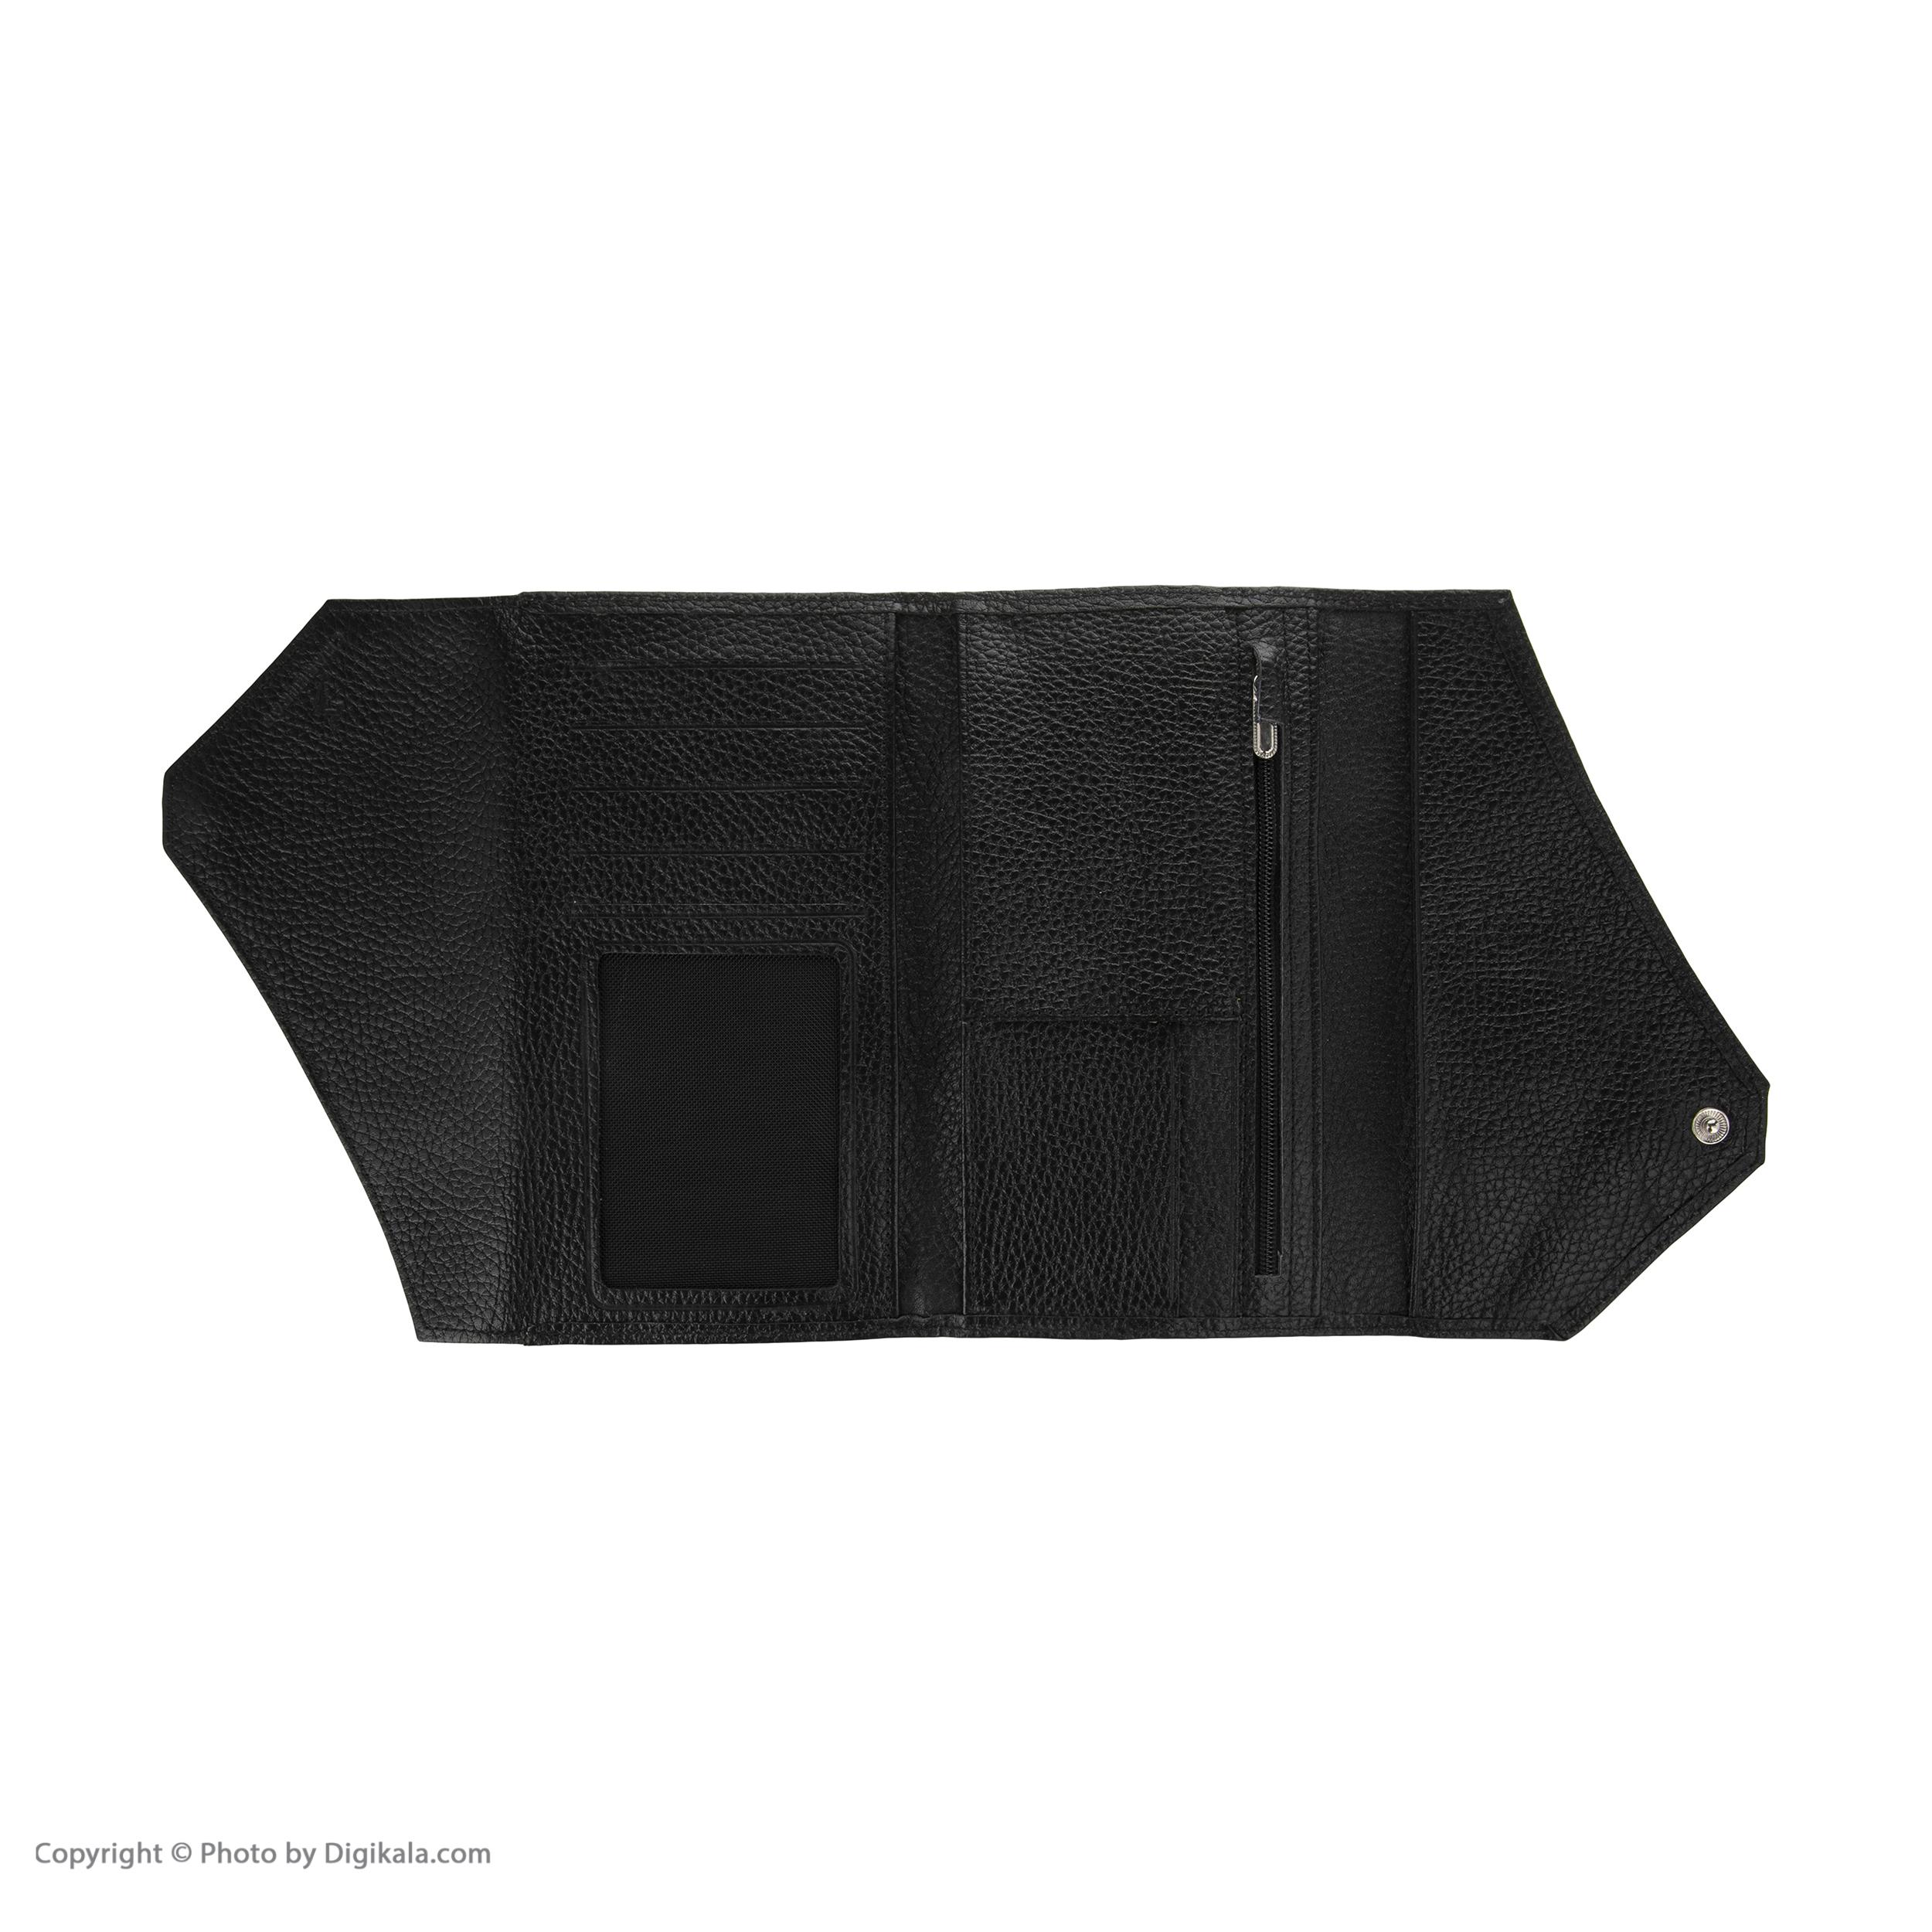 کیف پول چرمیران مدل 6059303 -  - 5